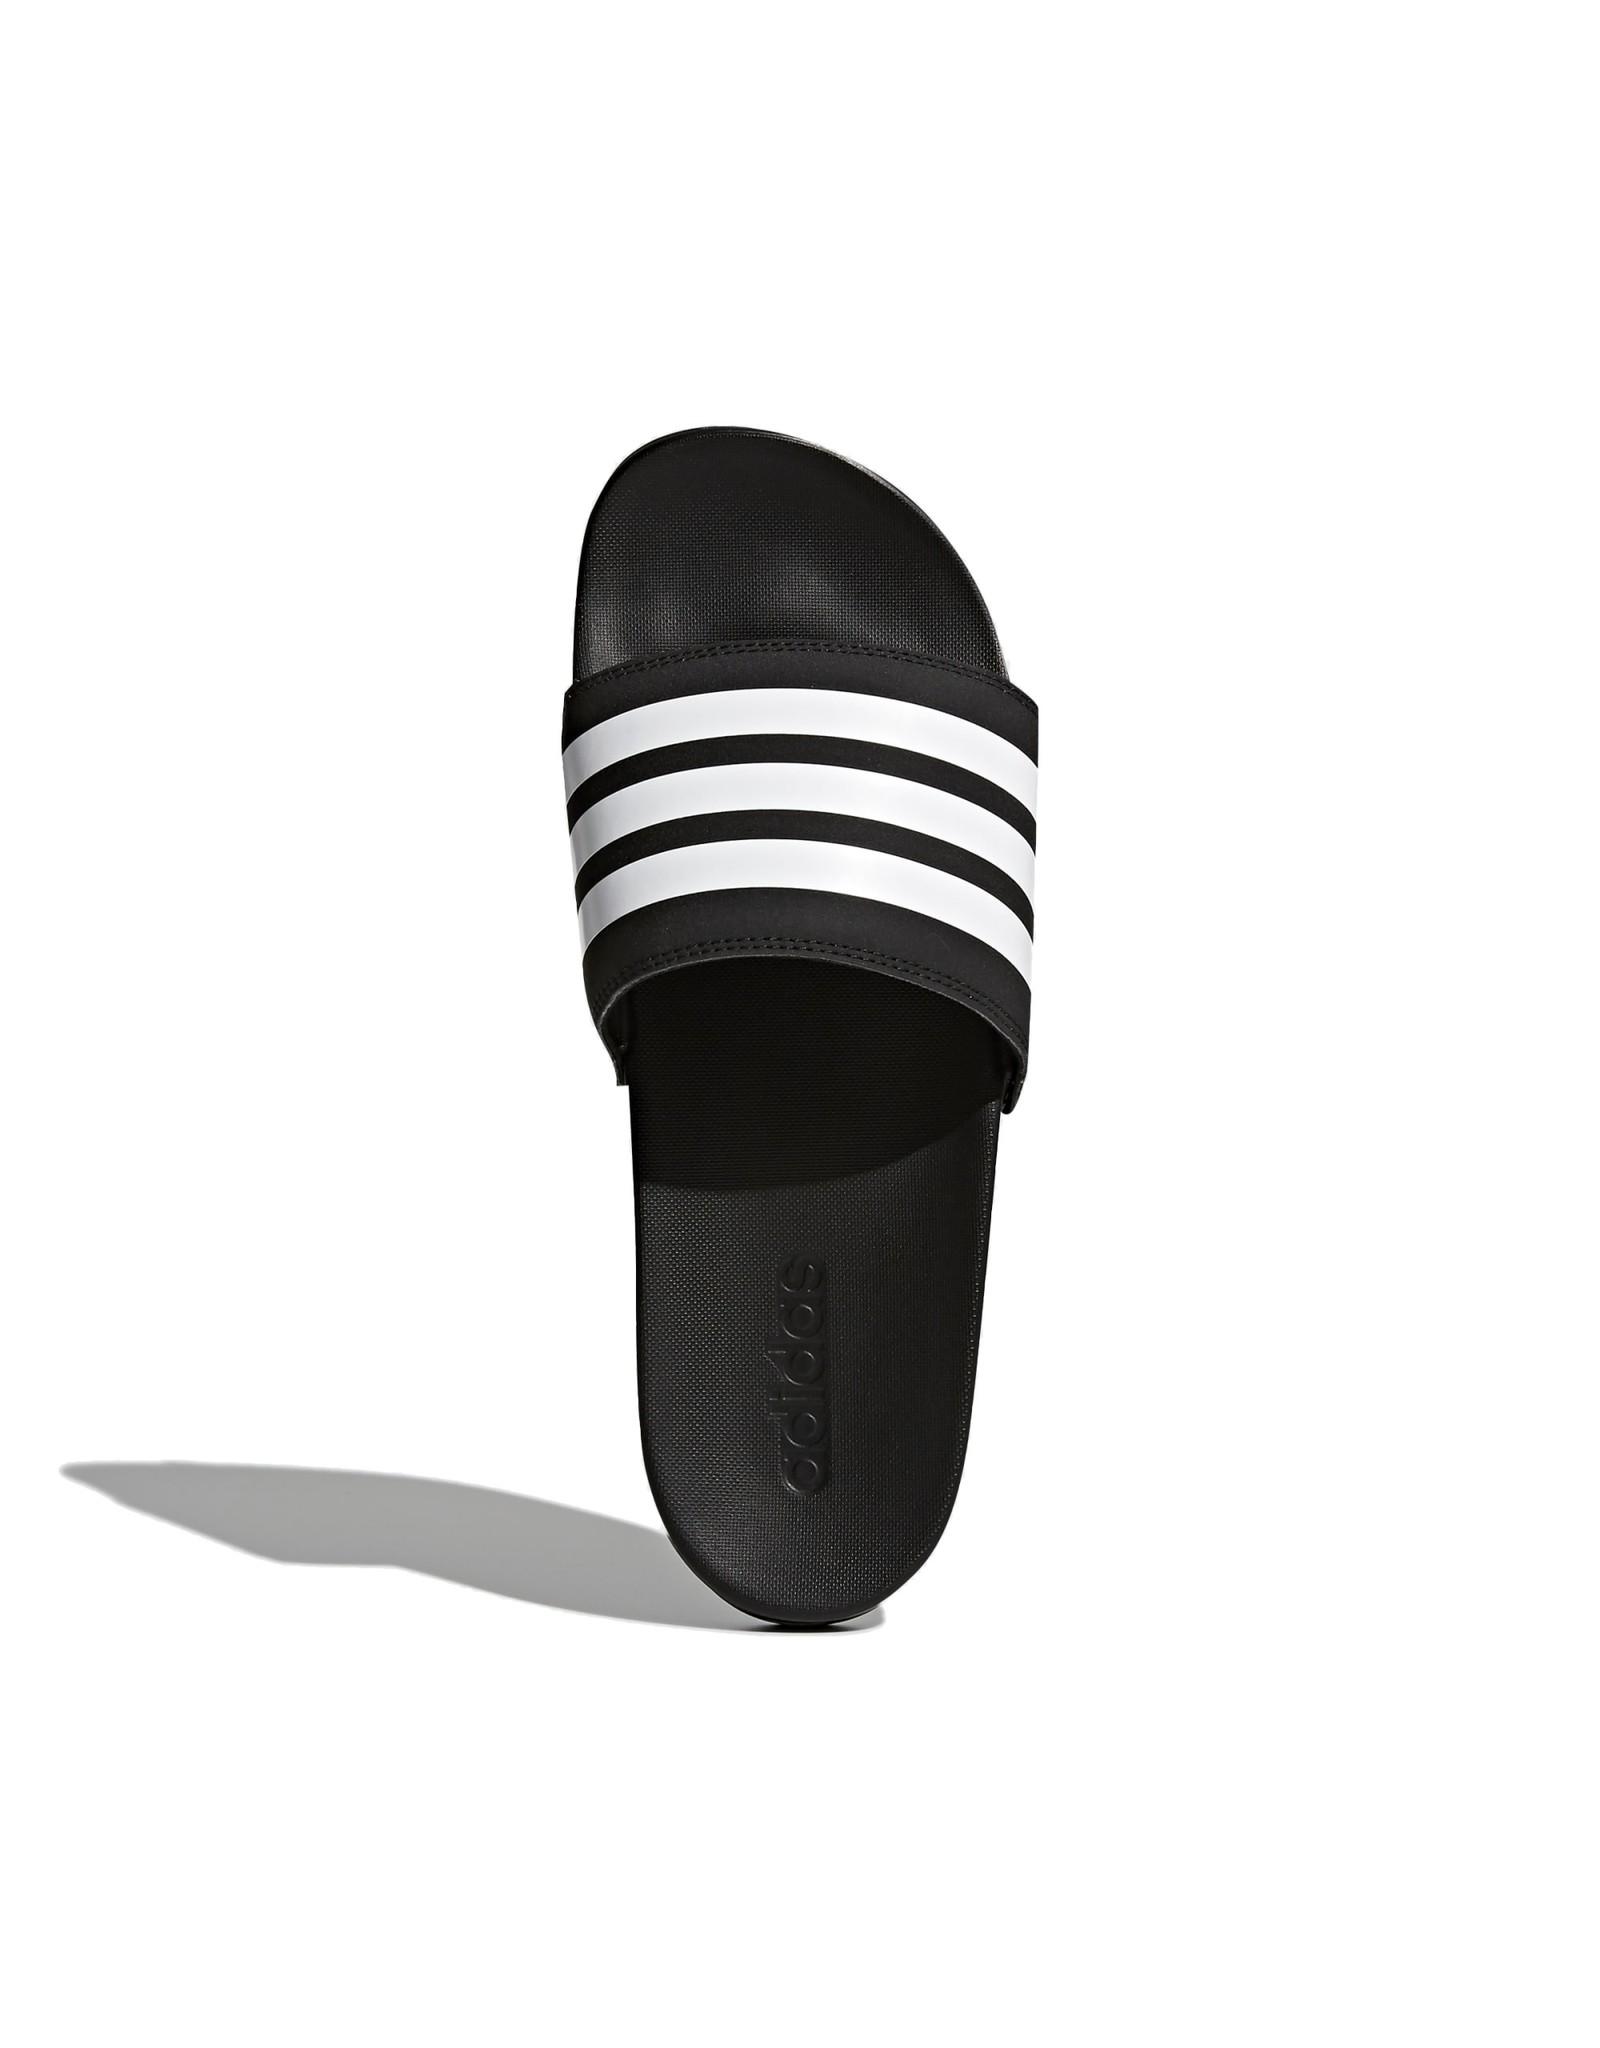 Adidas Adilette Comfort Slides - Black/White